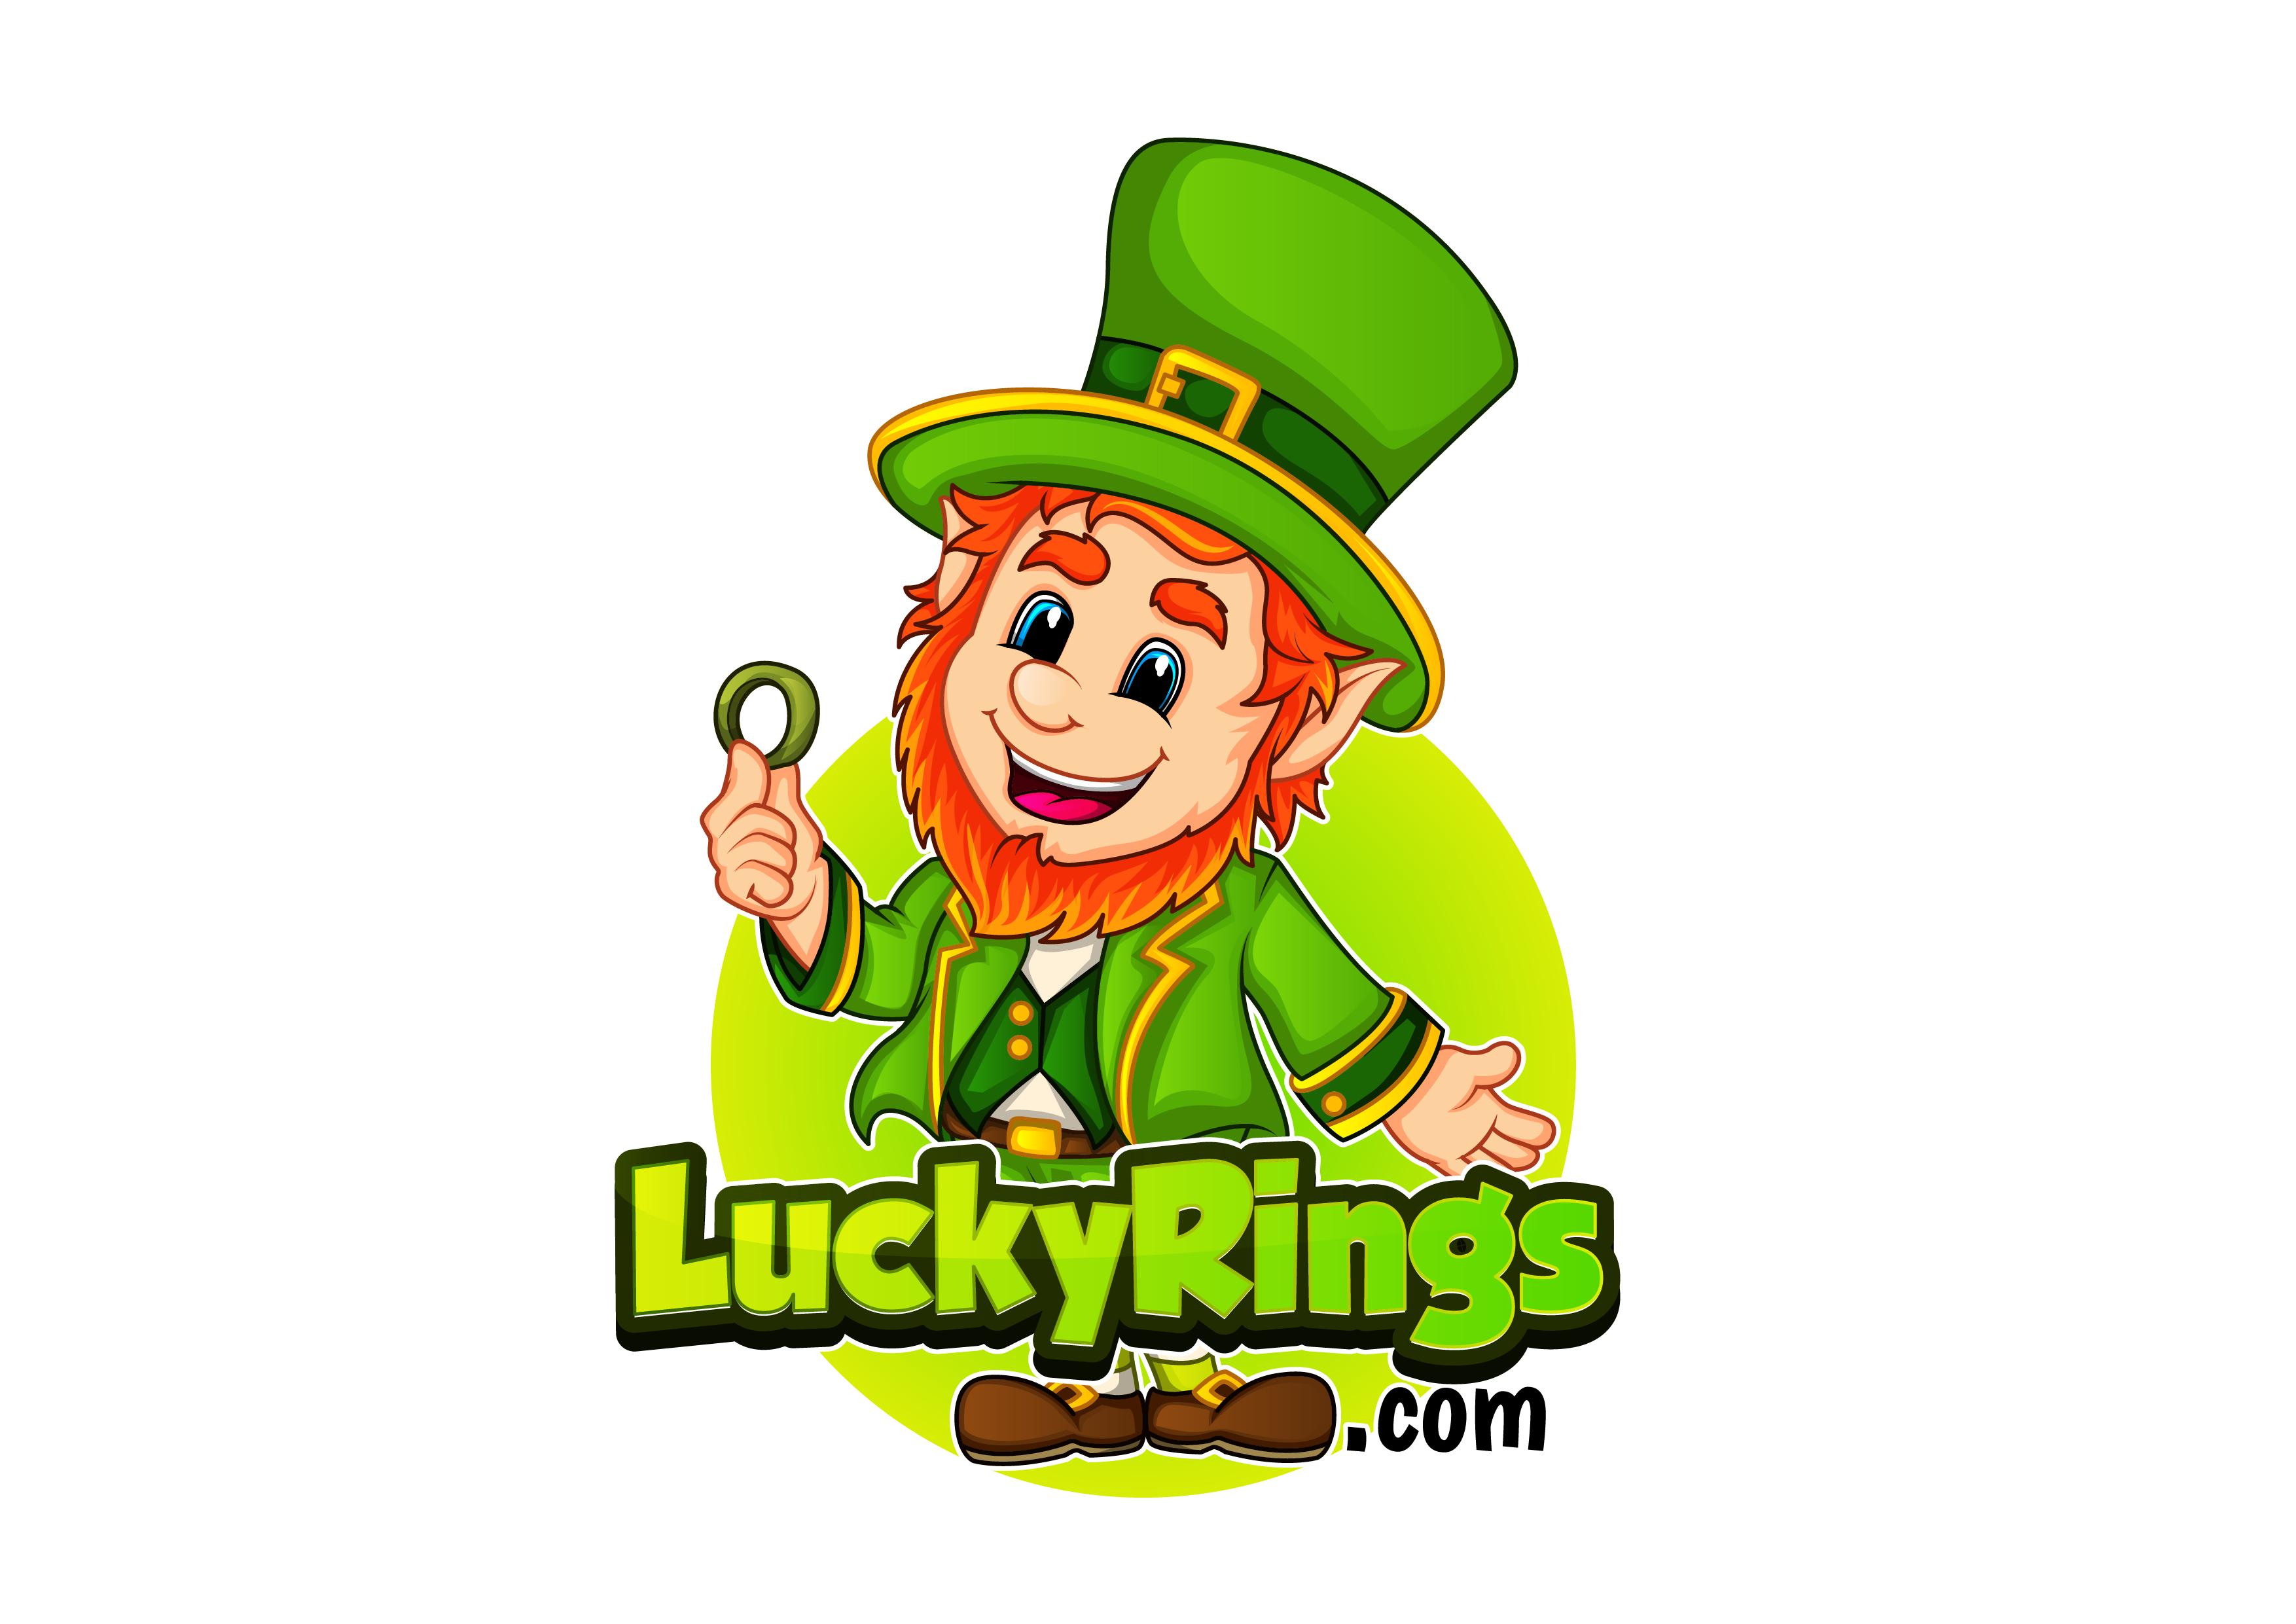 LuckyRings.com